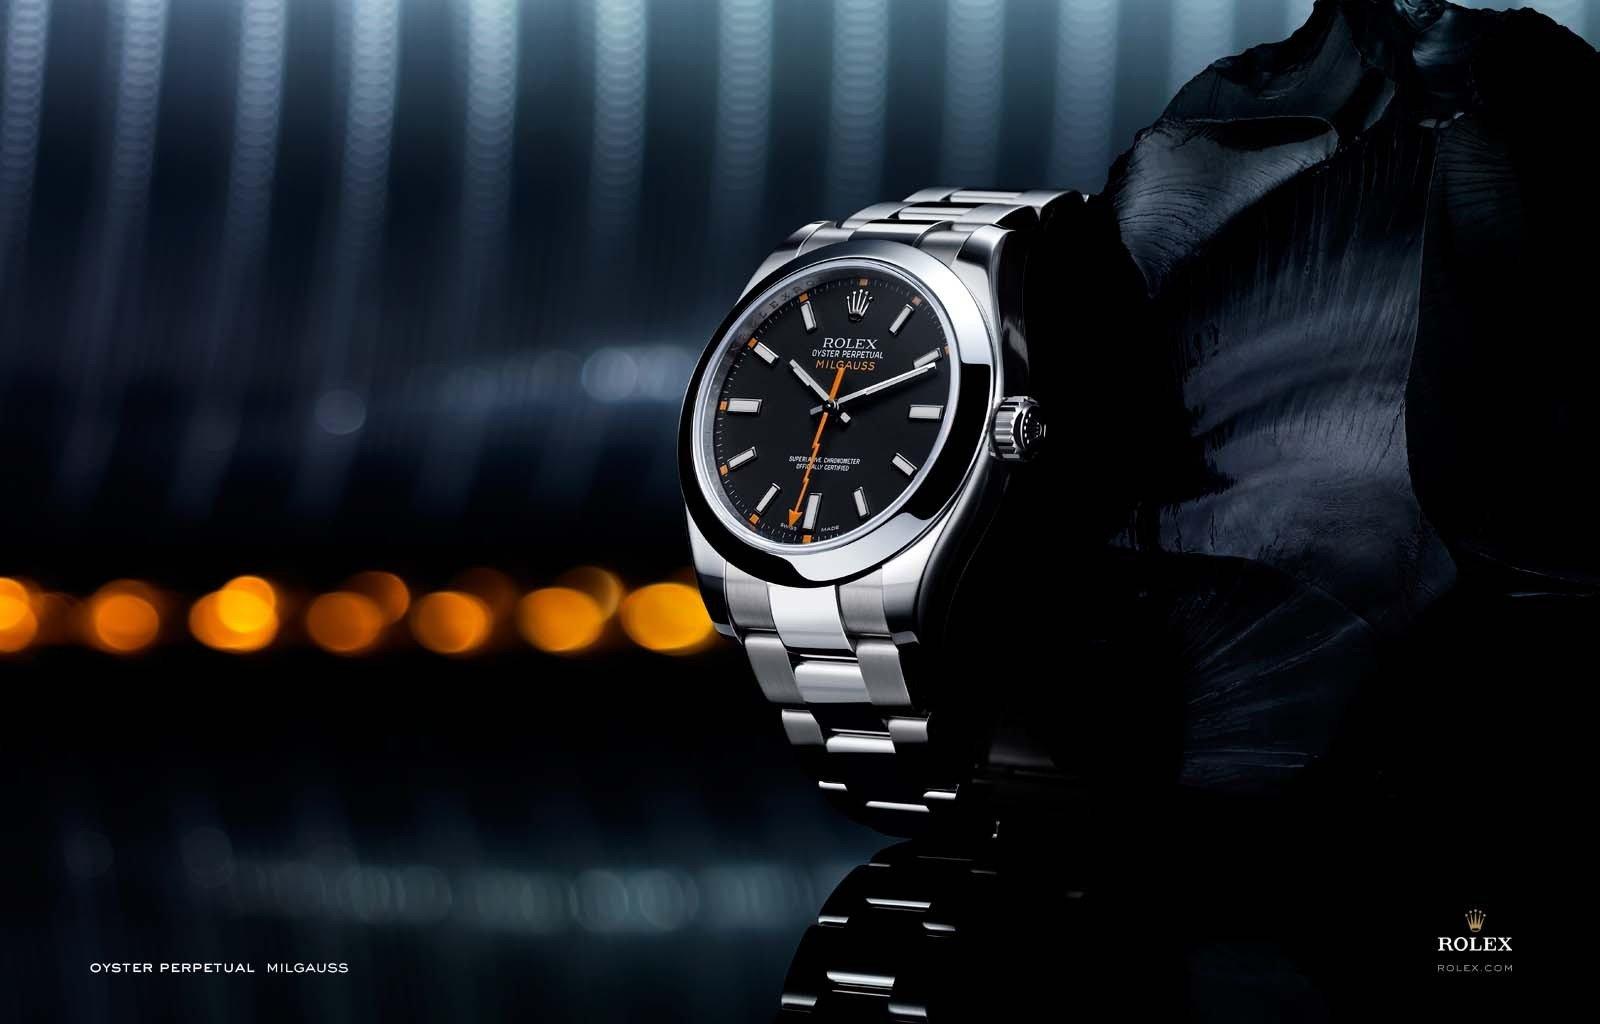 Popular Rolex Wallpaper - a4f39e51bf1f73548471b25d4b95c690 Trends_40774.jpg